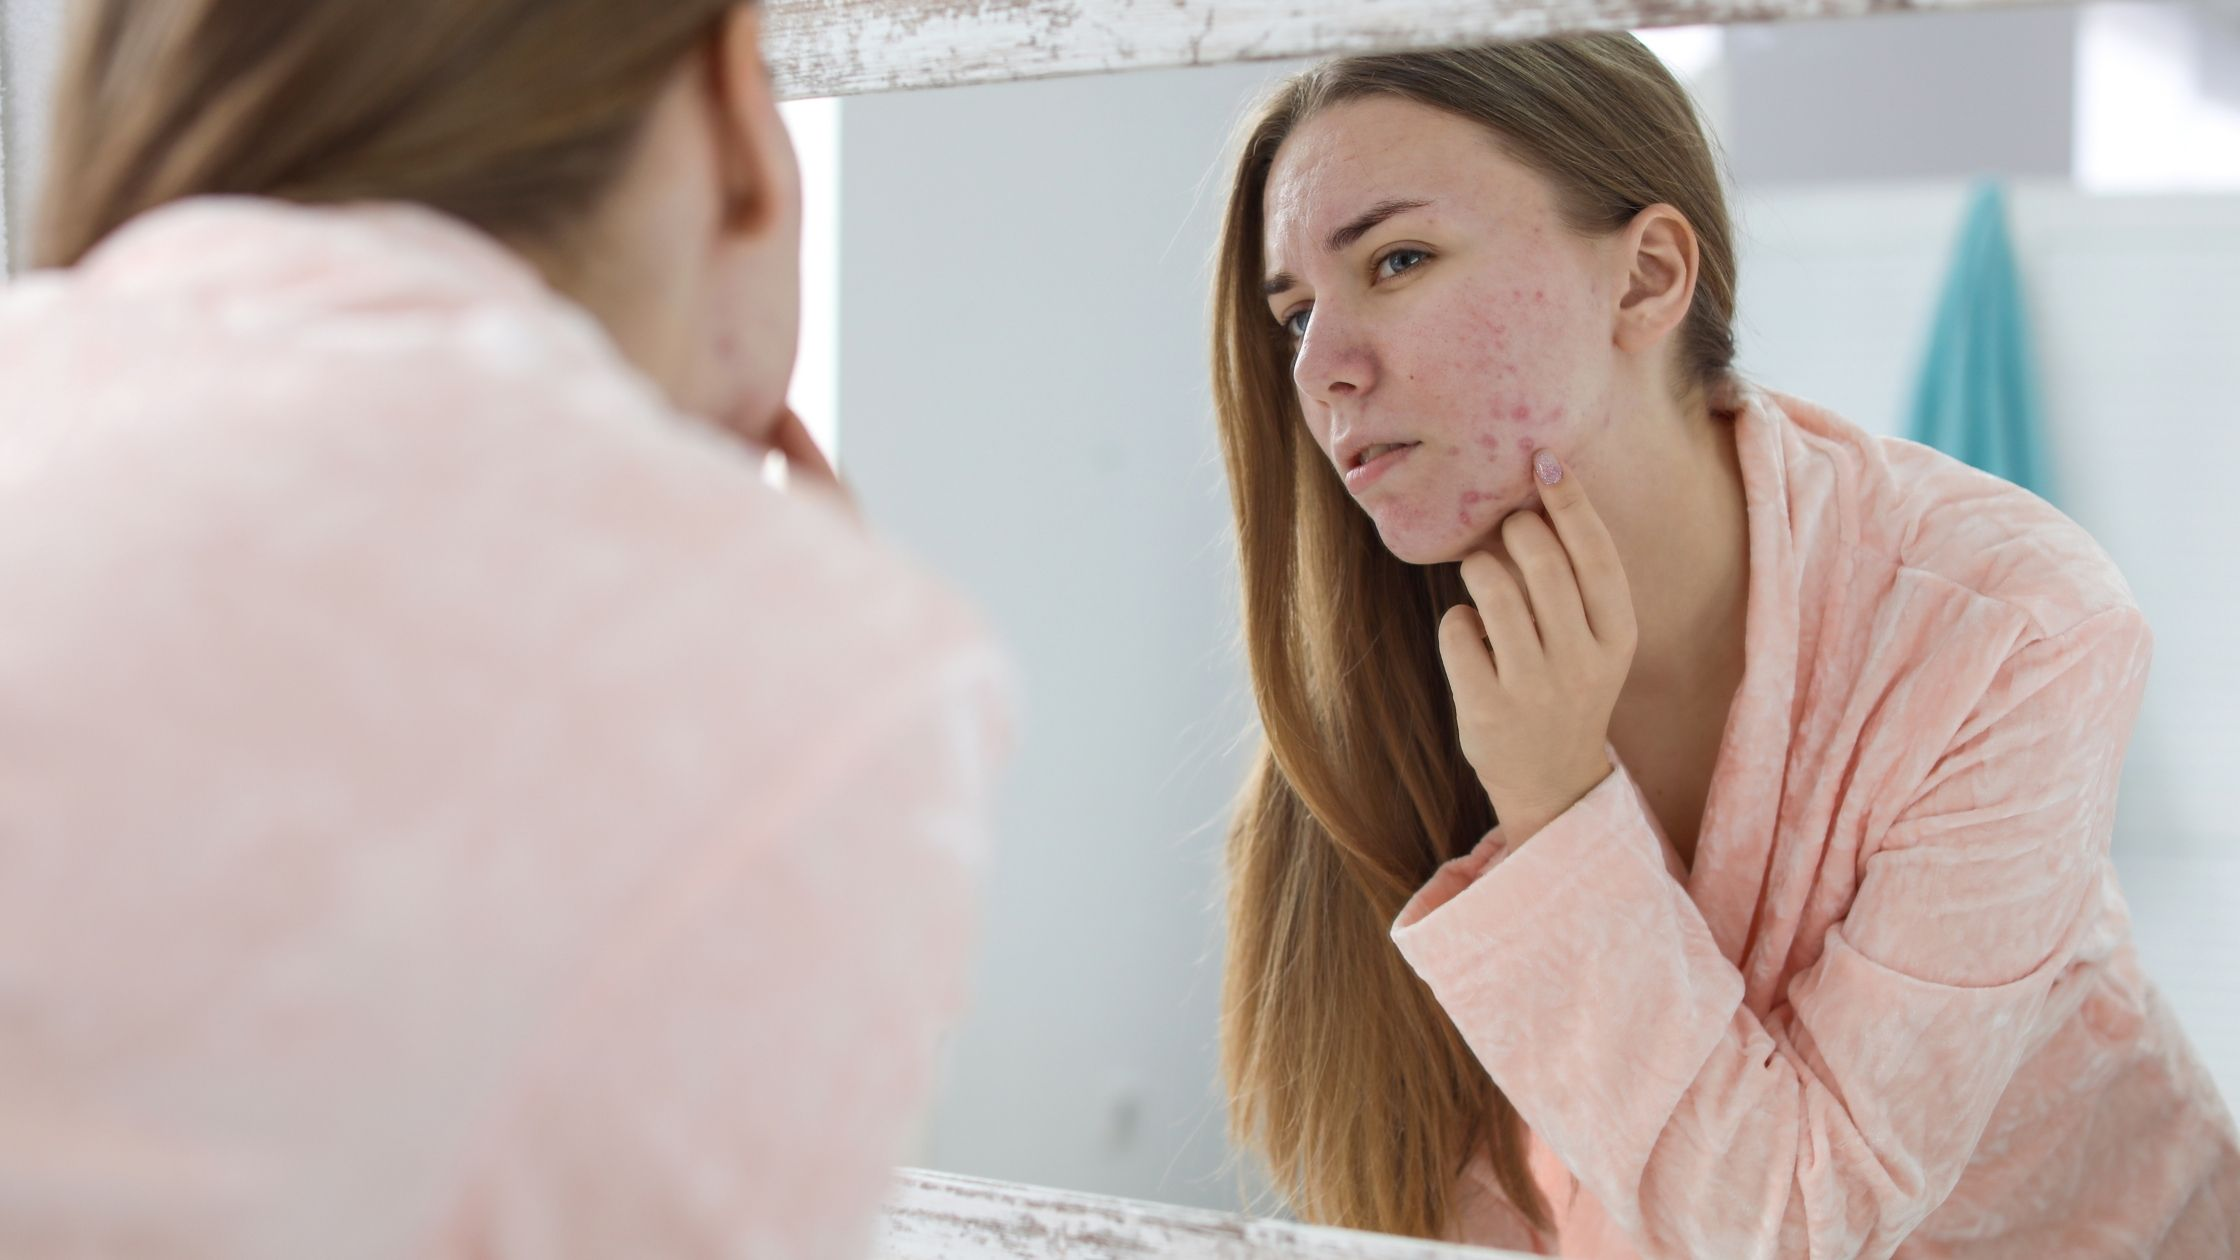 Vrouw met acné